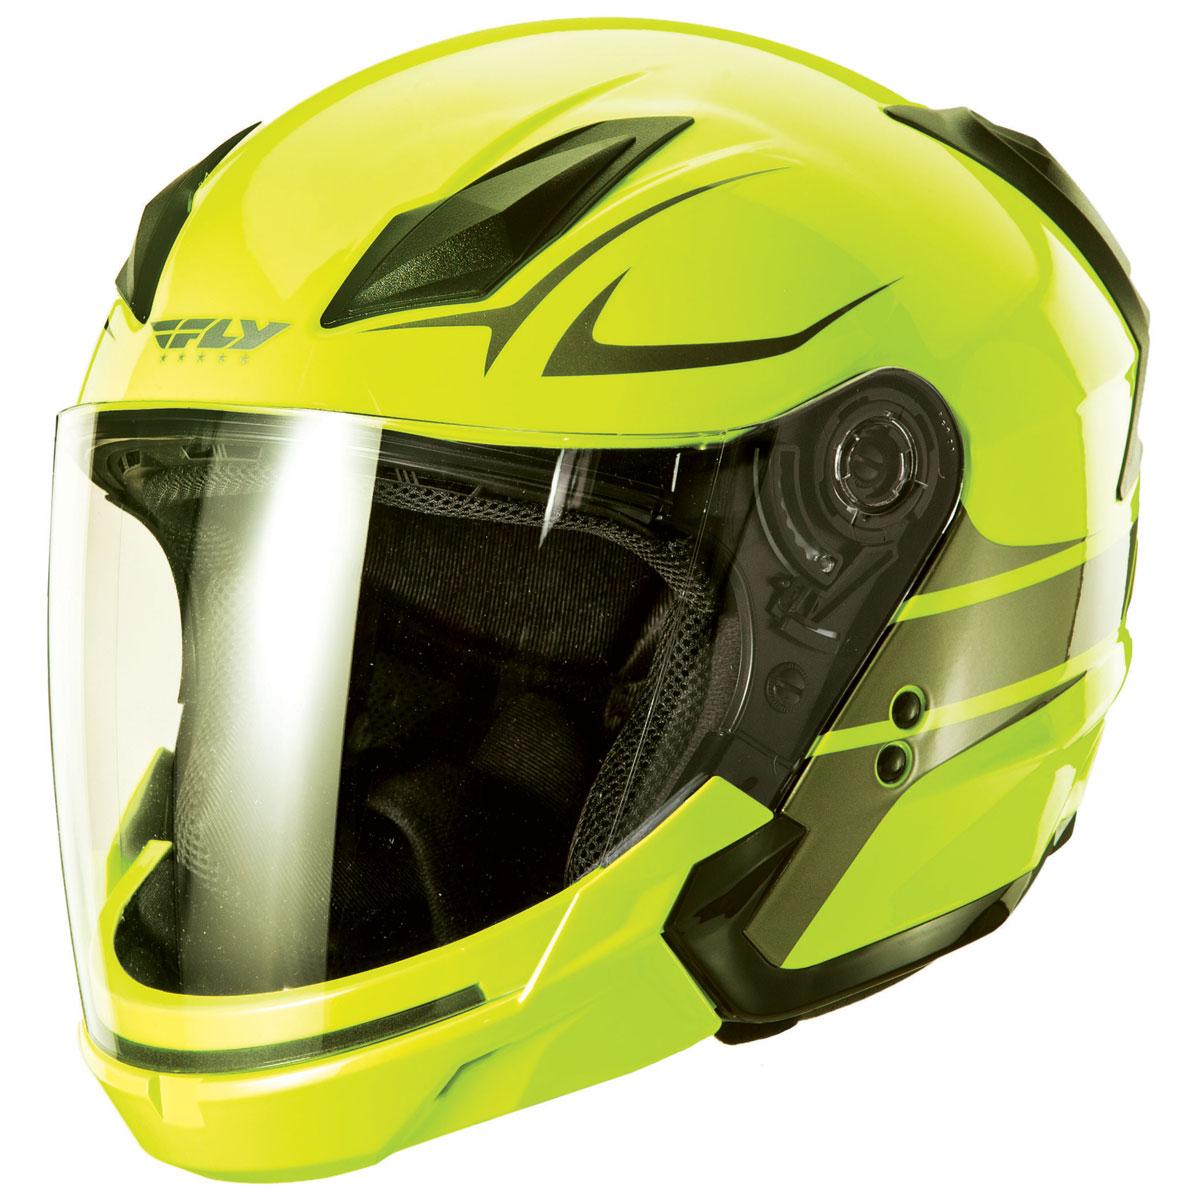 FLY Racing Street Tourist Vista Hiviz/Gunmetal Modular Helmet